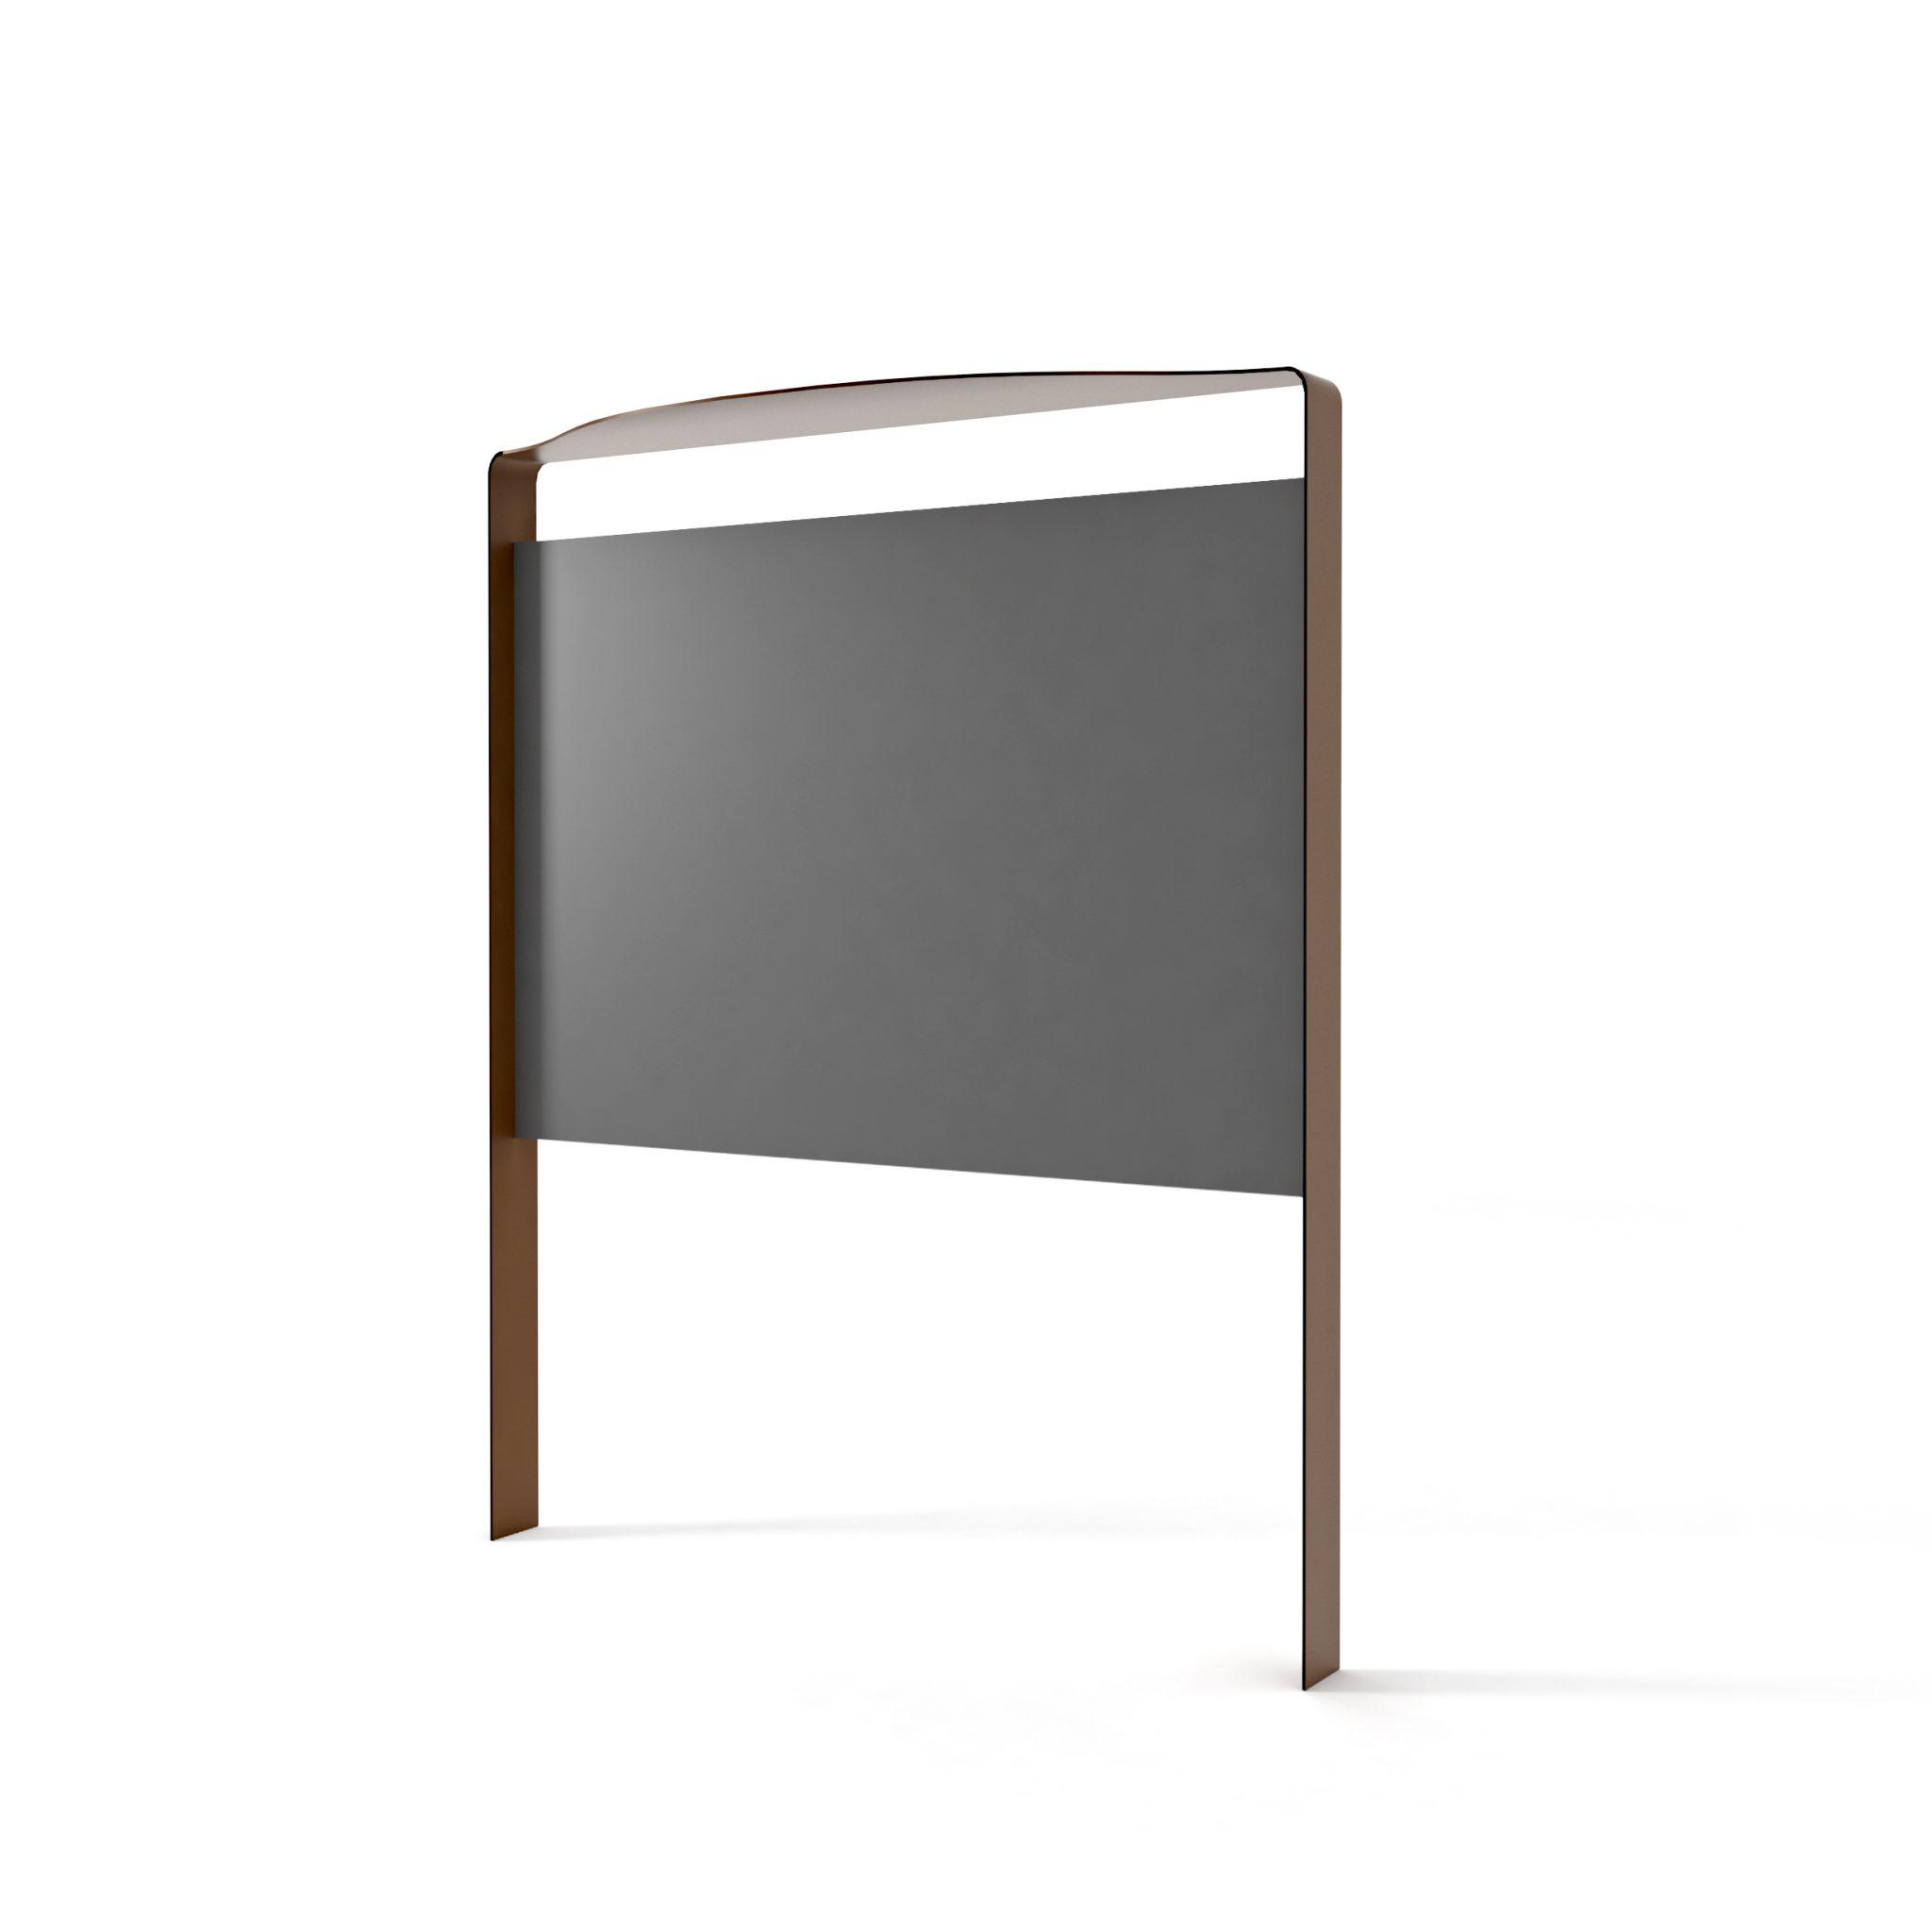 street-furniture-totem-LAB23